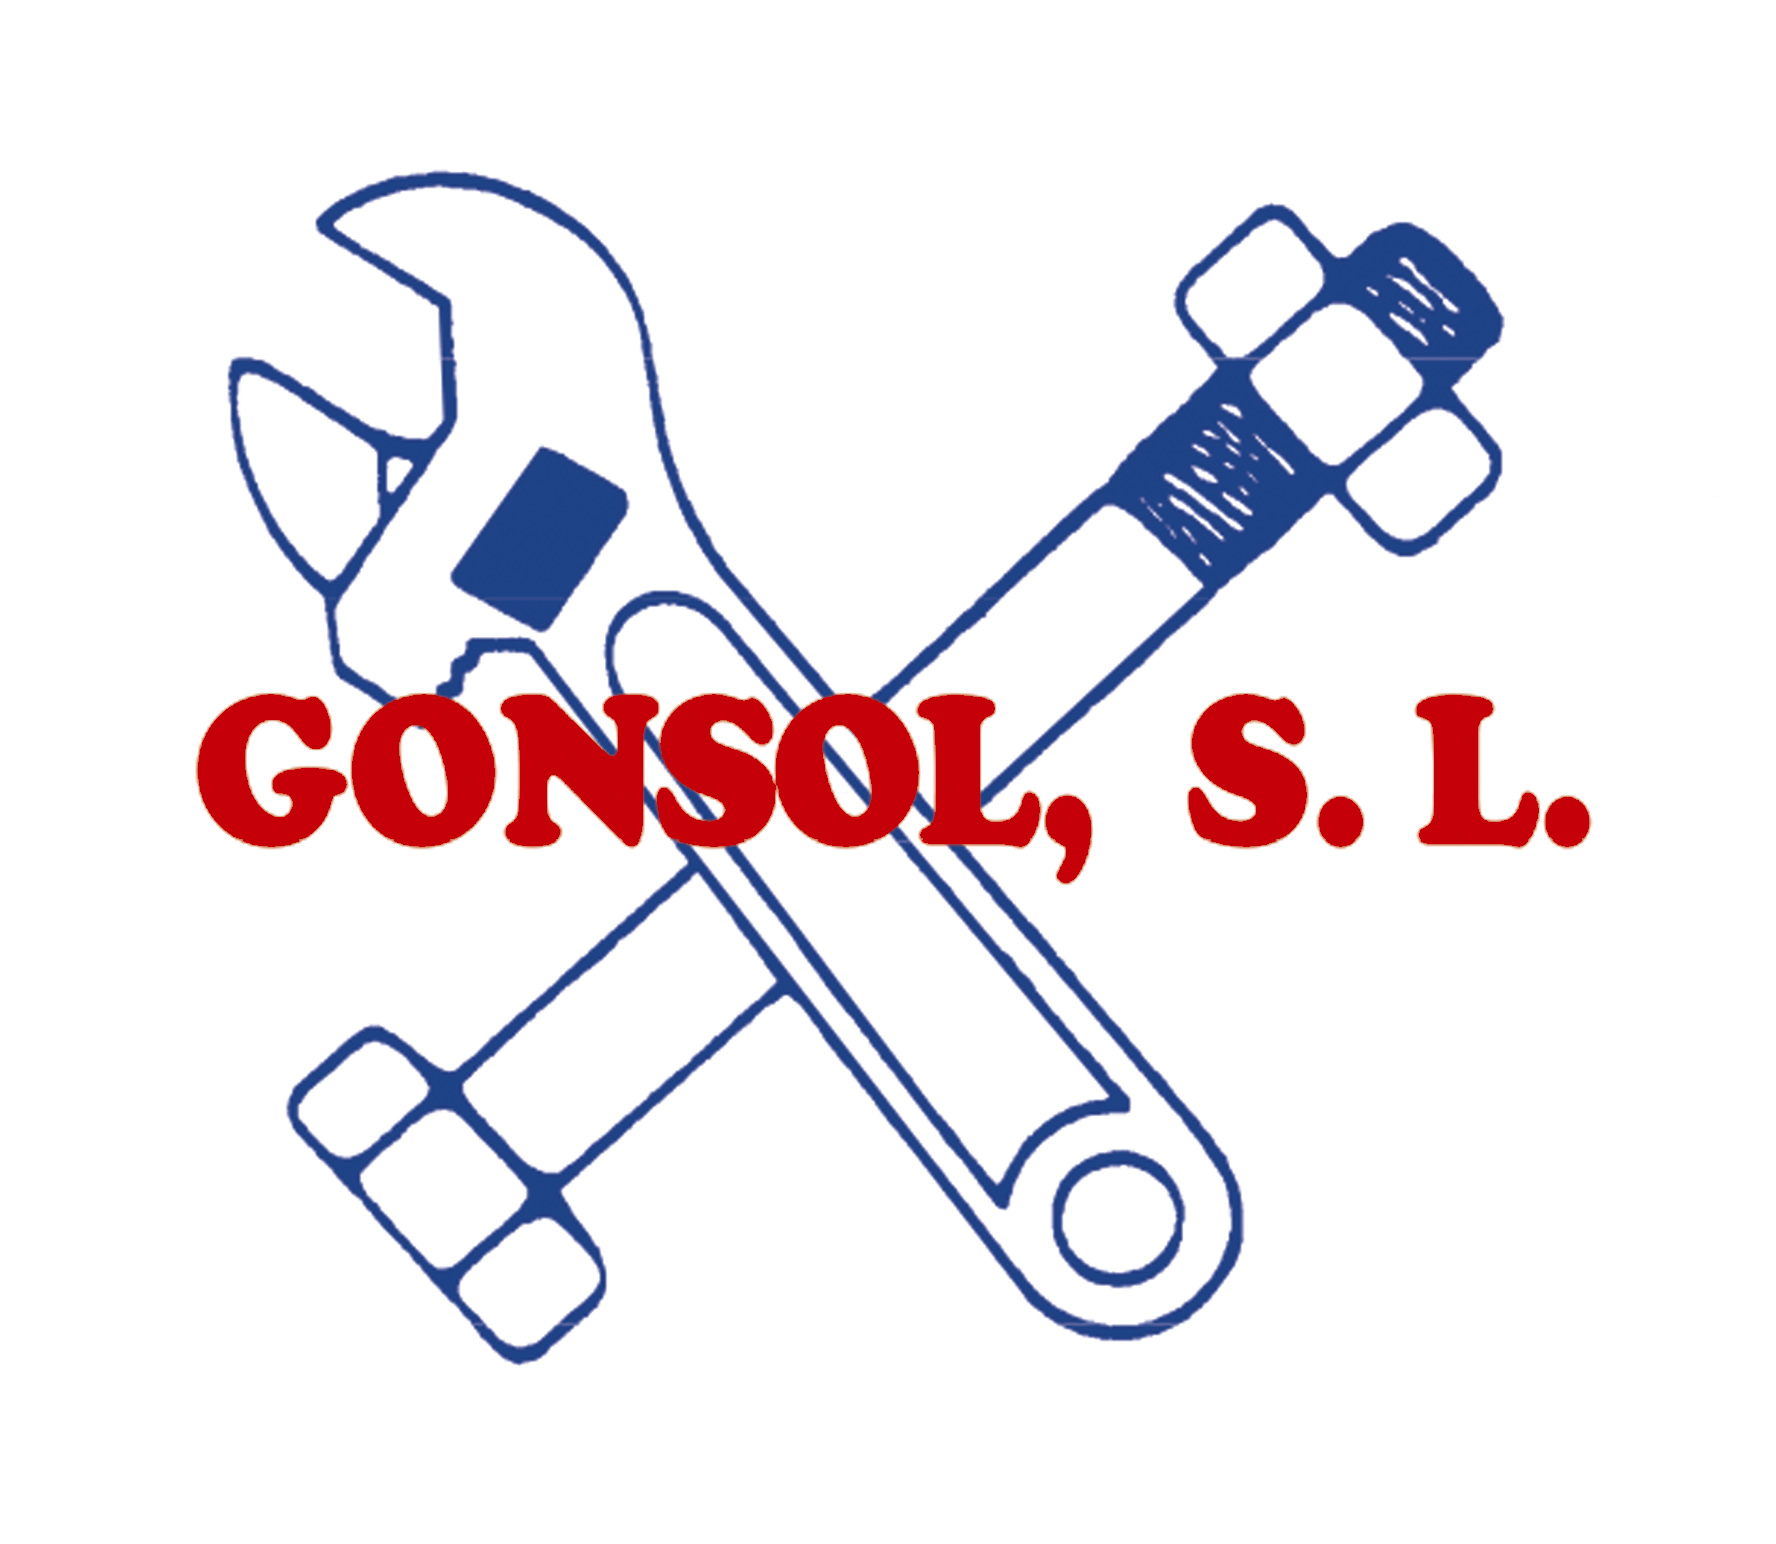 Gonsol